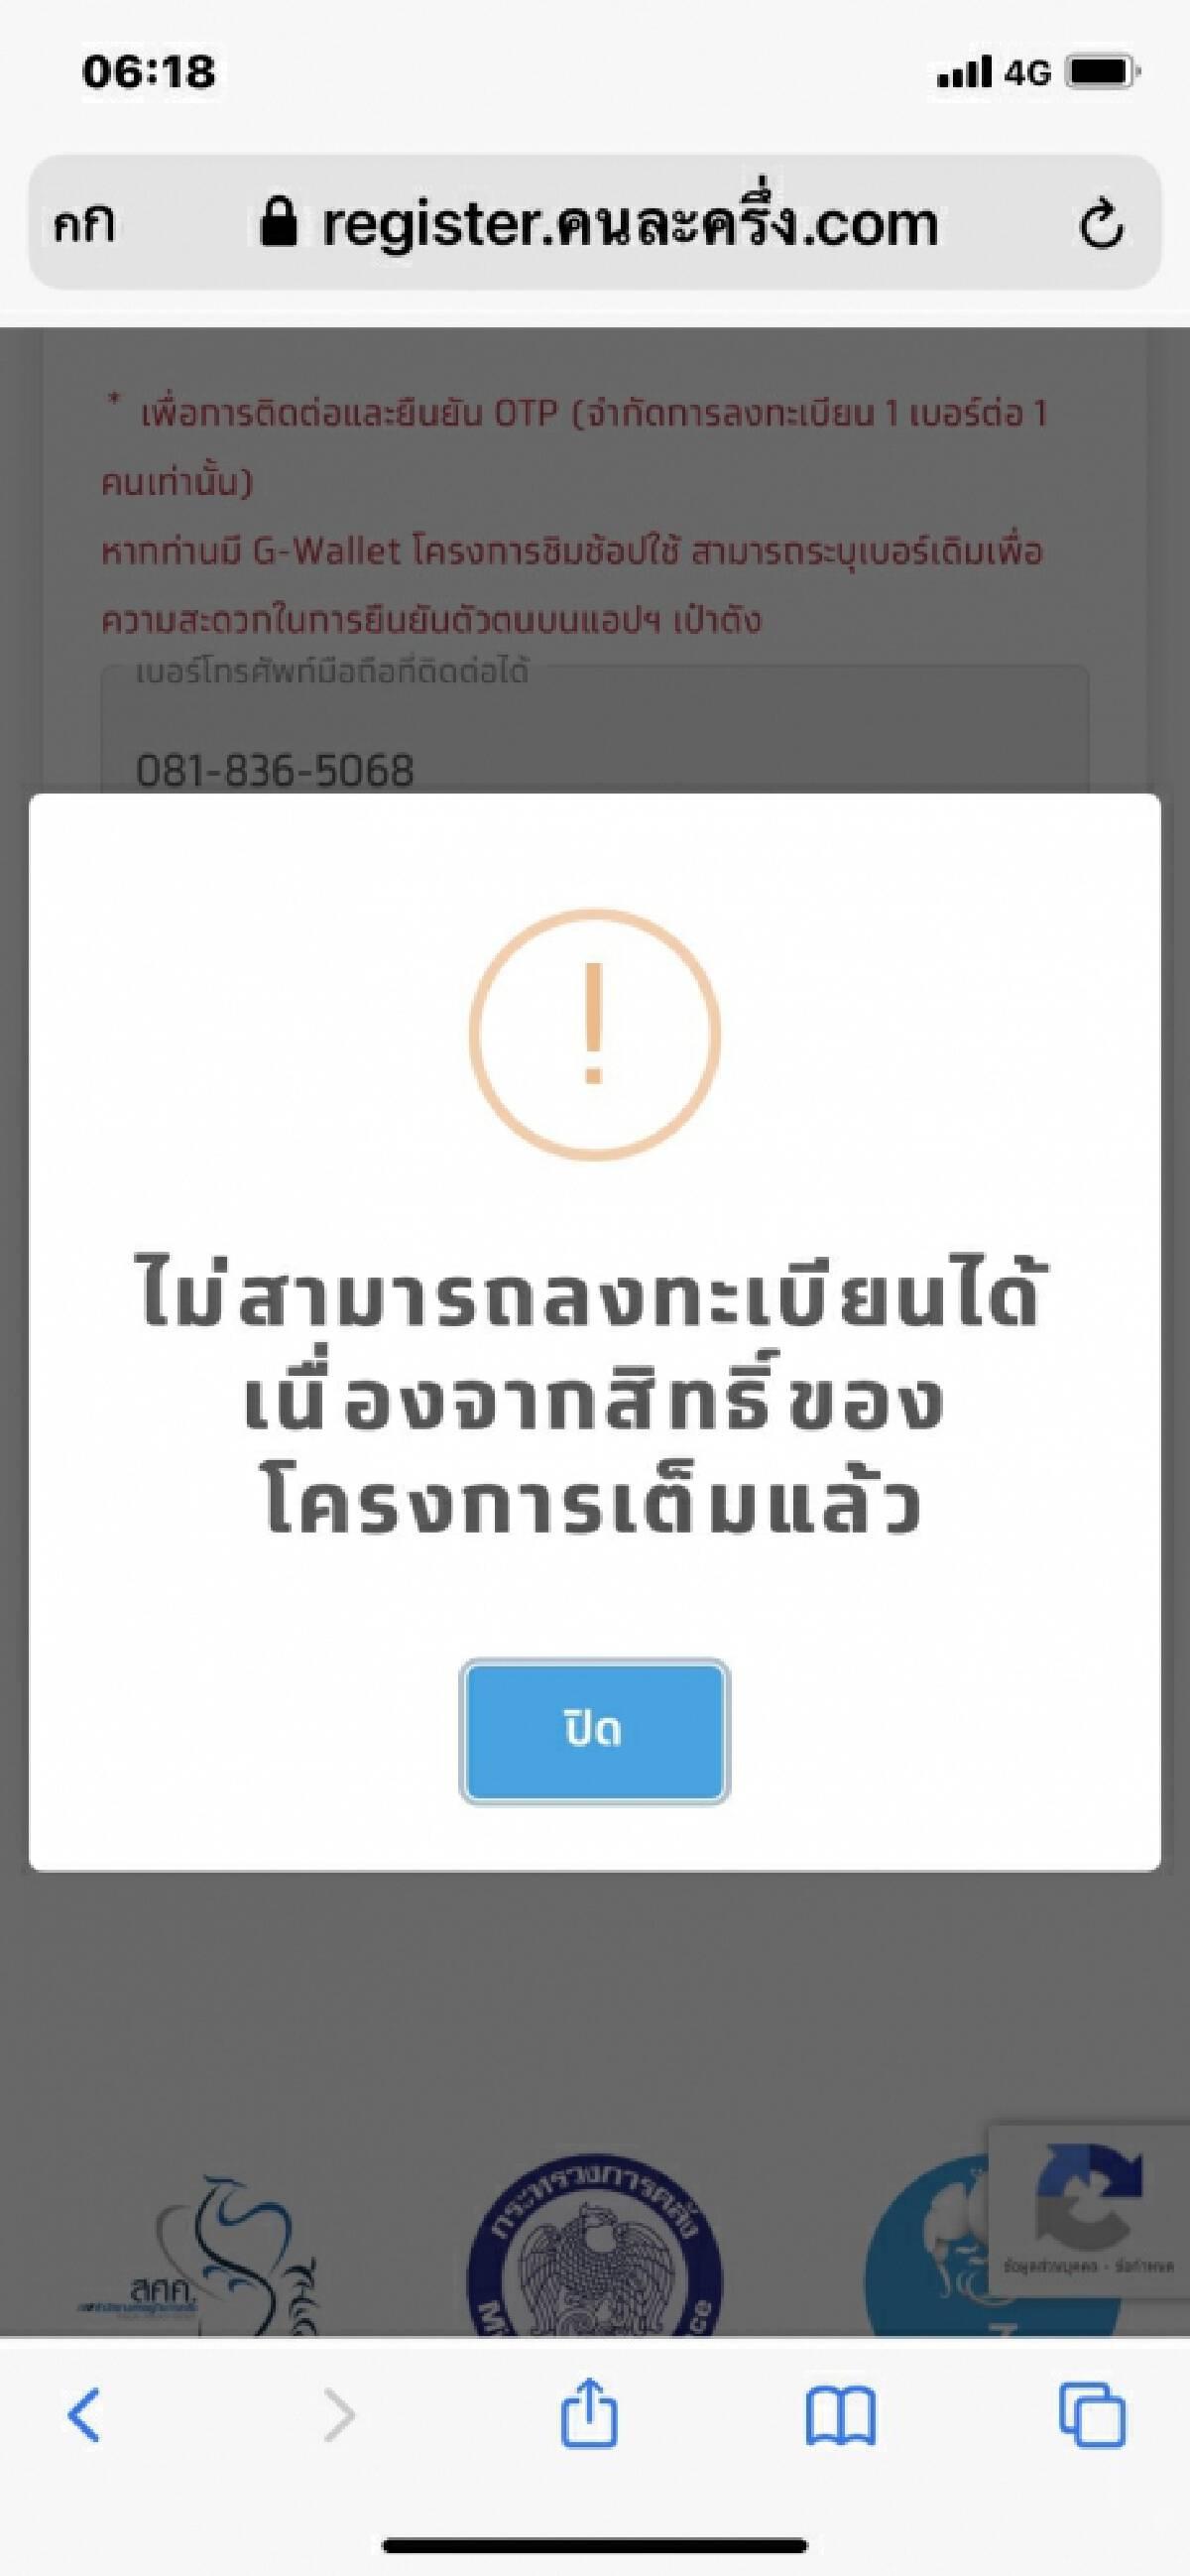 Netizens complain after Let's Go Halves registration is full in 10 minutes